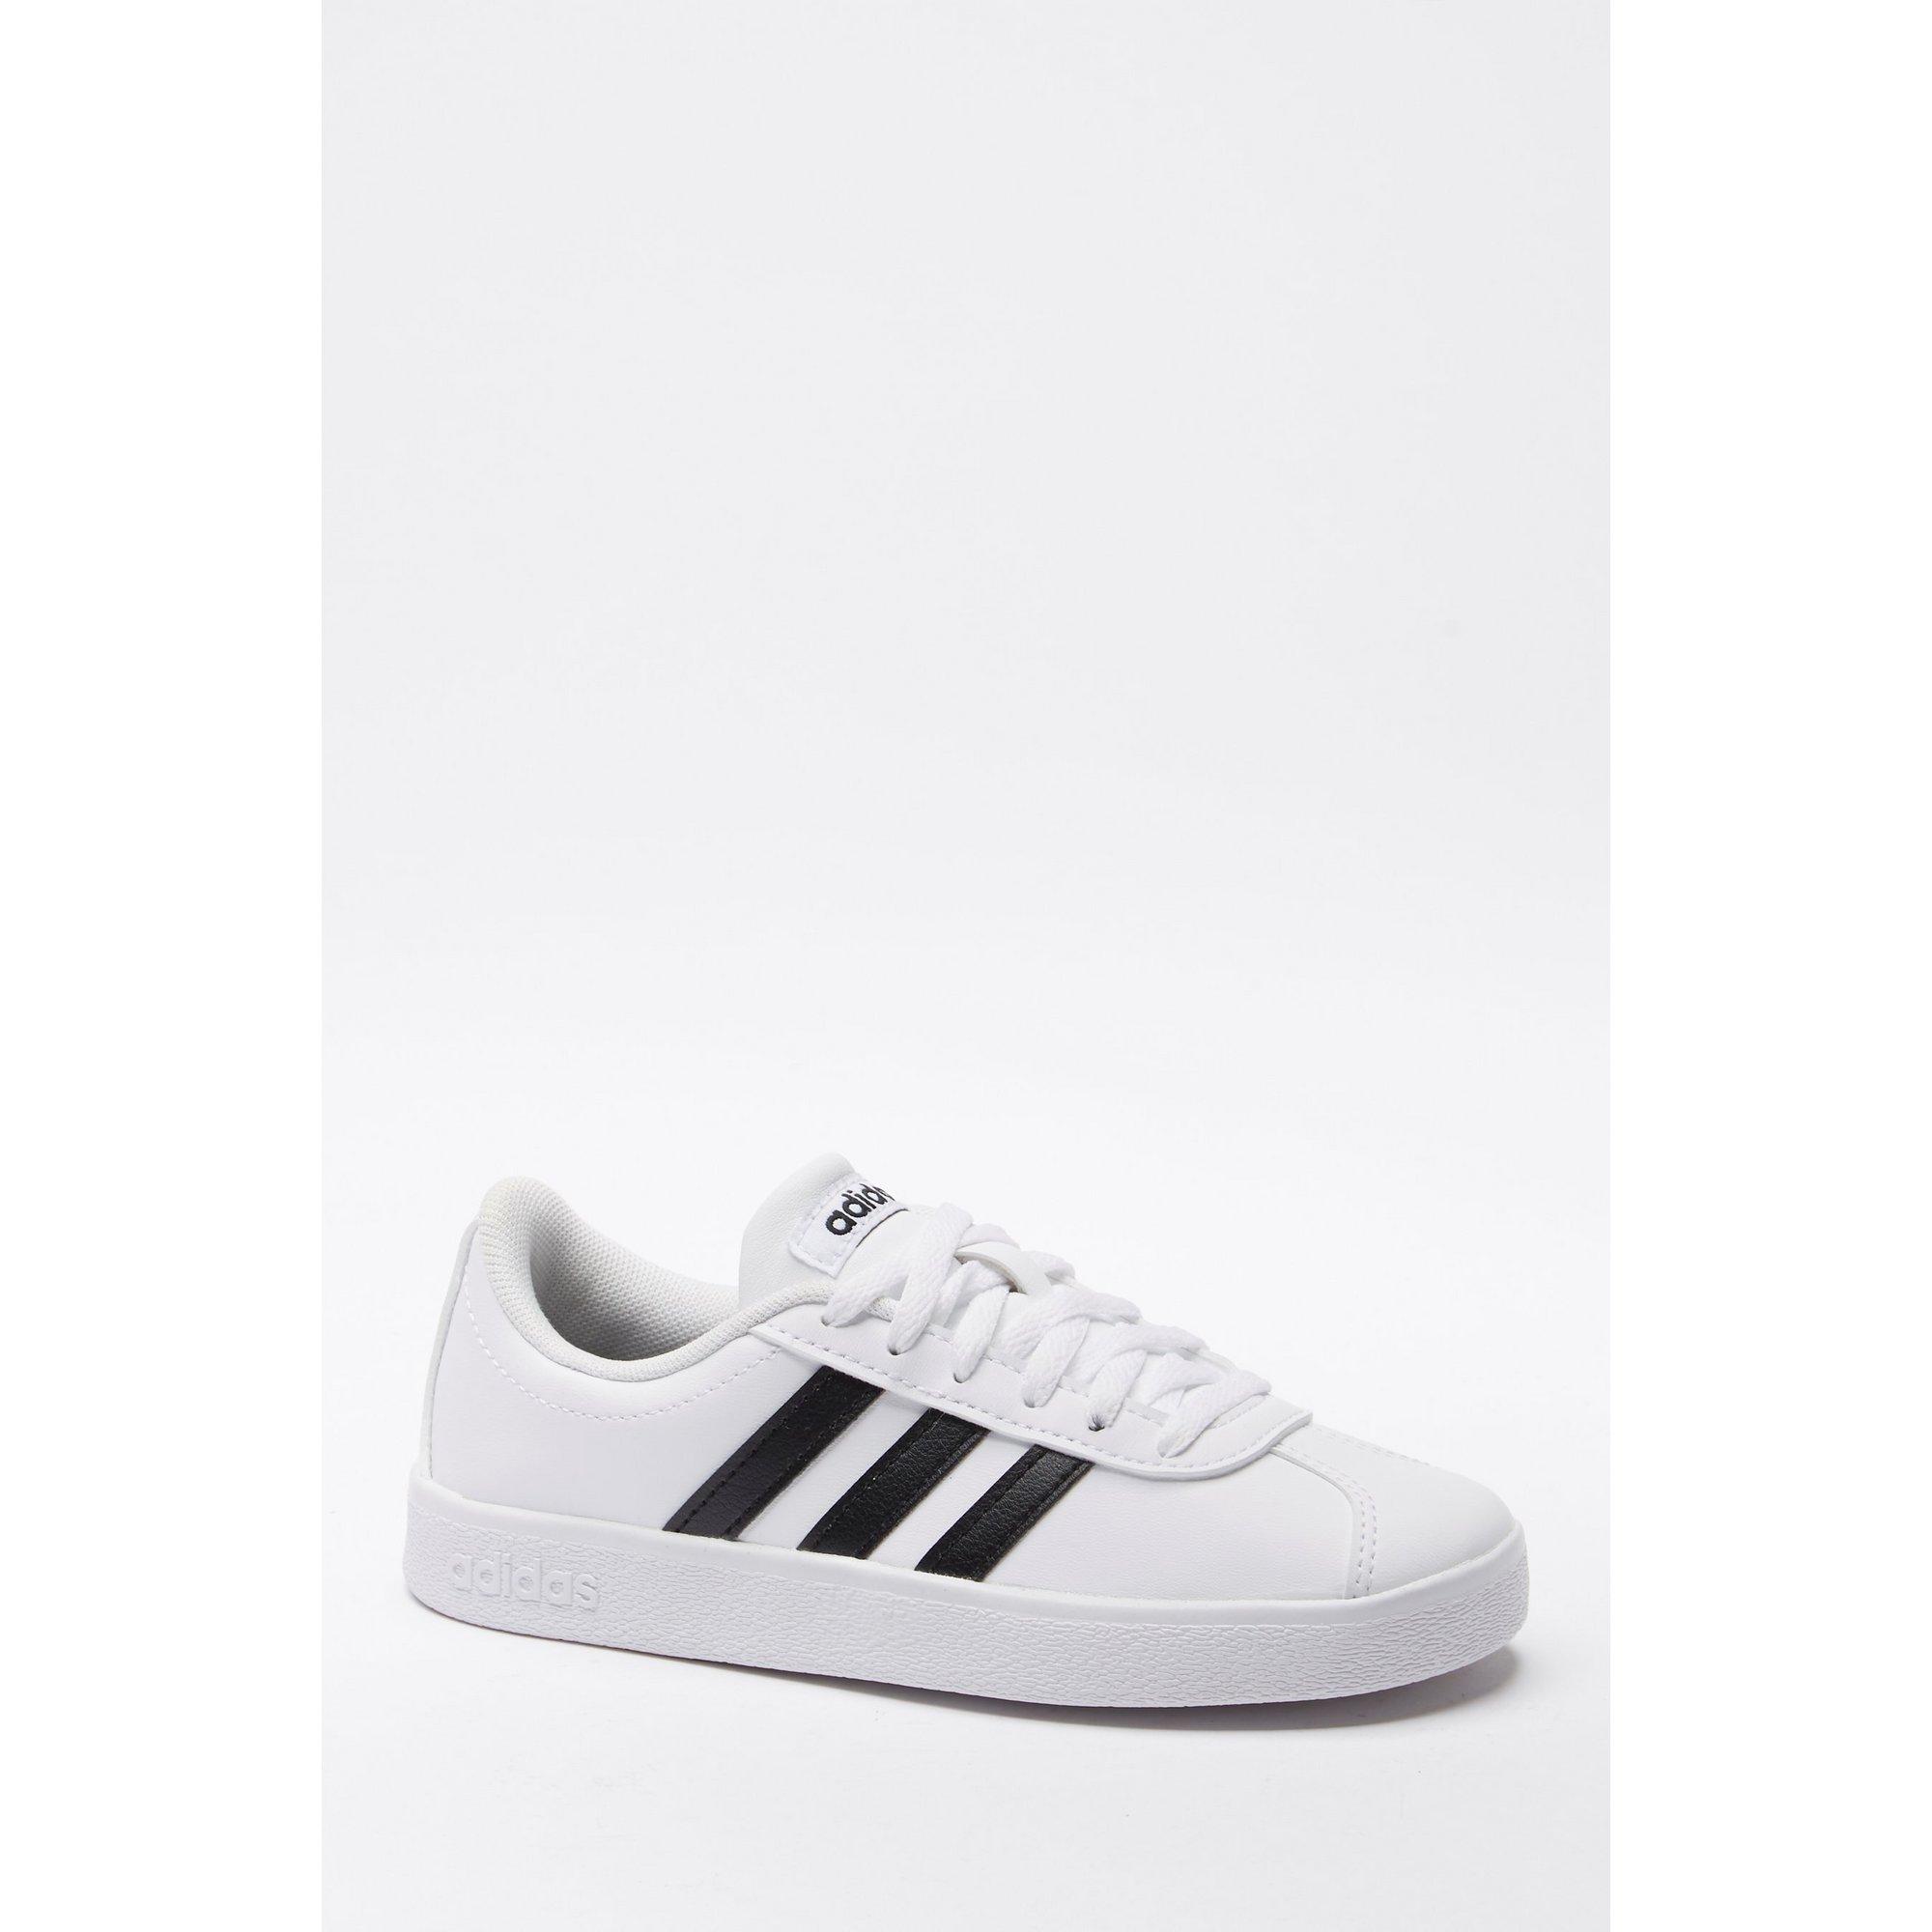 Image of adidas VL Court White Junior Trainers